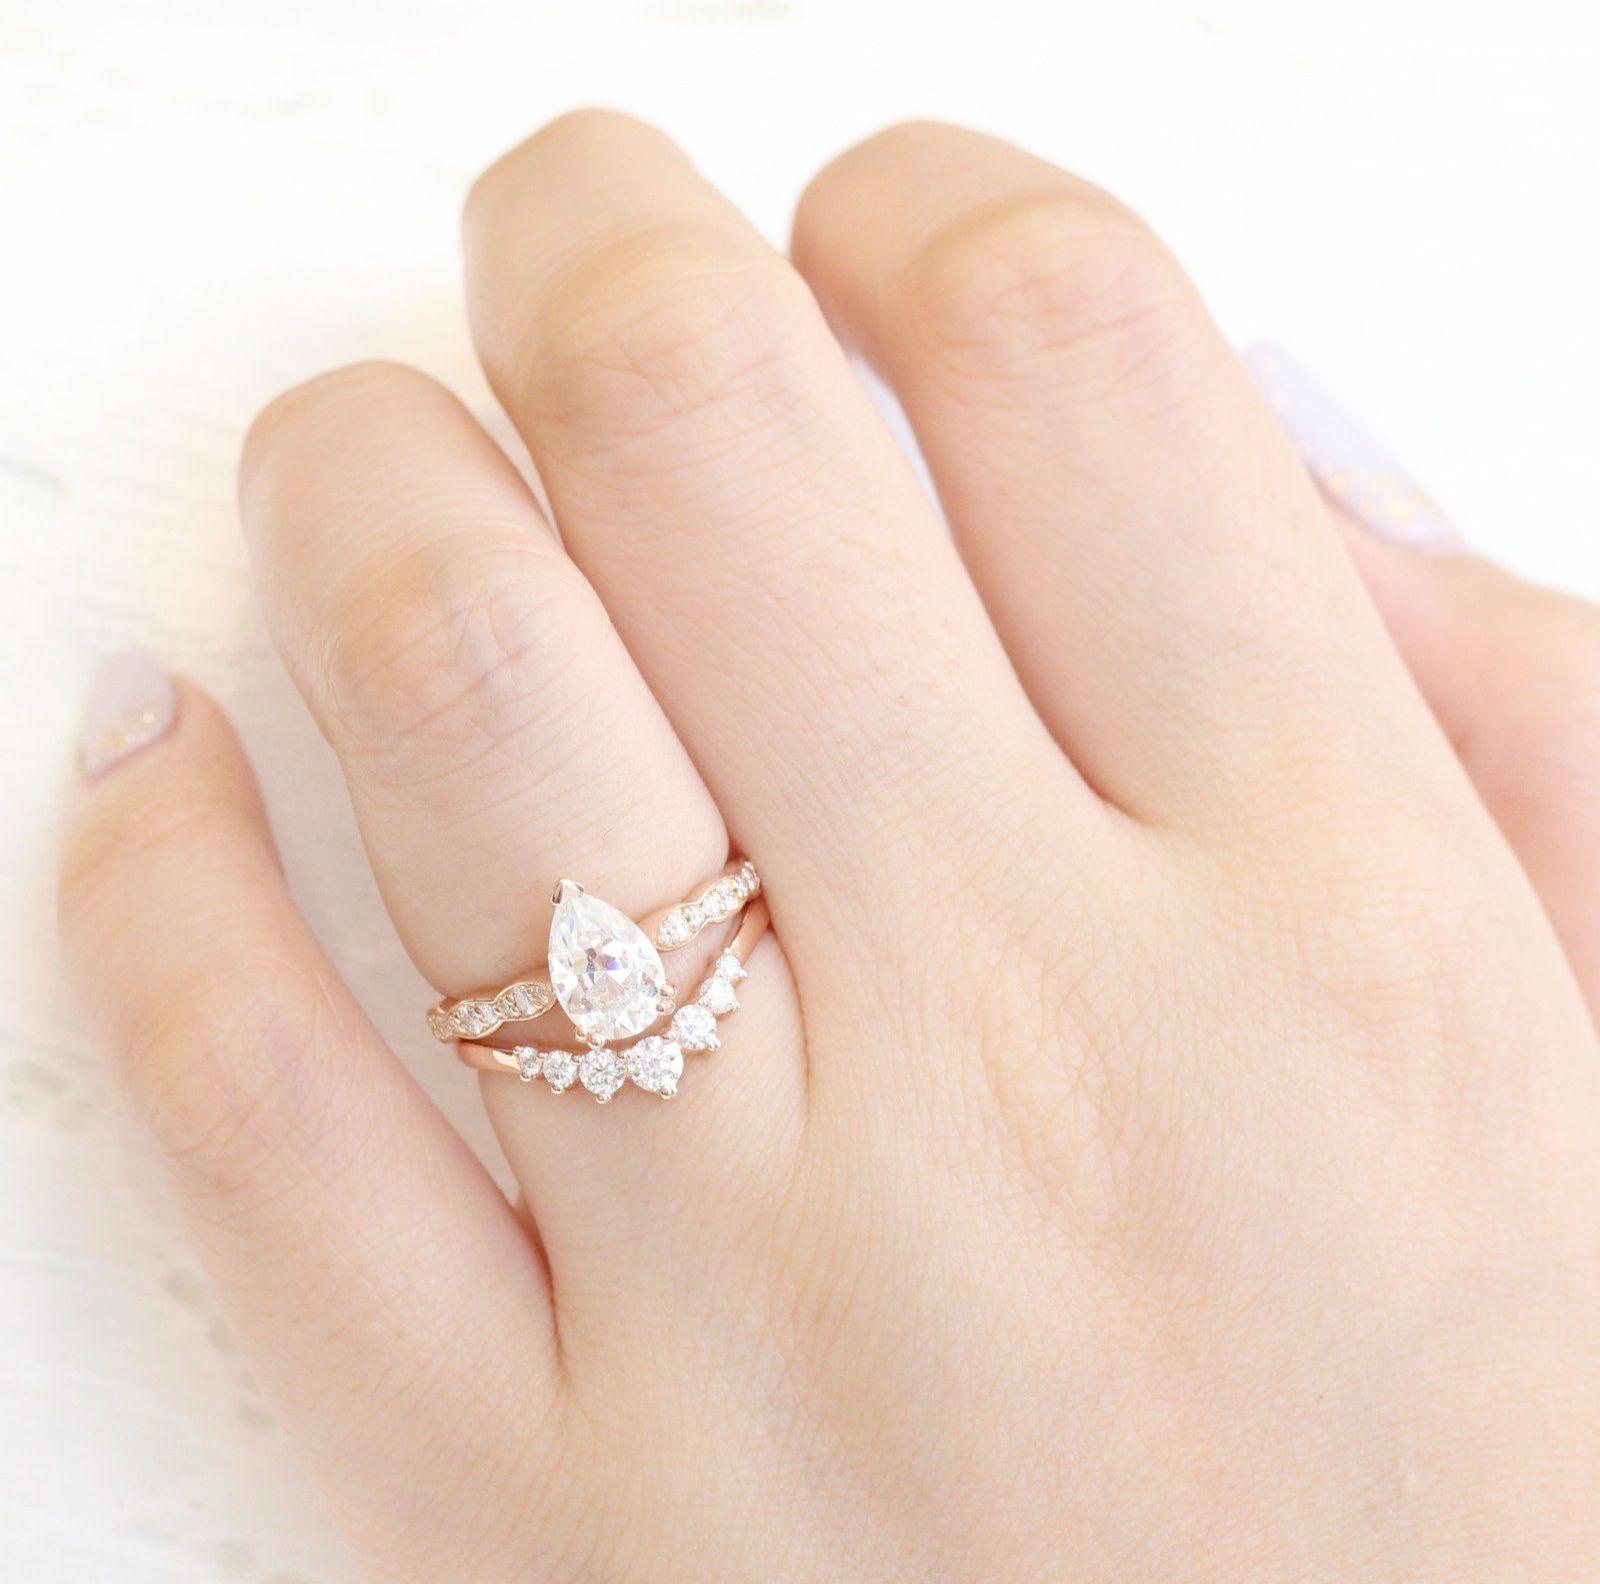 Wedding Rings Sets Gold Jewellery Repair Wherever Jewellery Exchange Walk Nottingham Wedding Diamond Wedding Bands Unique Engagement Rings Buy Wedding Rings